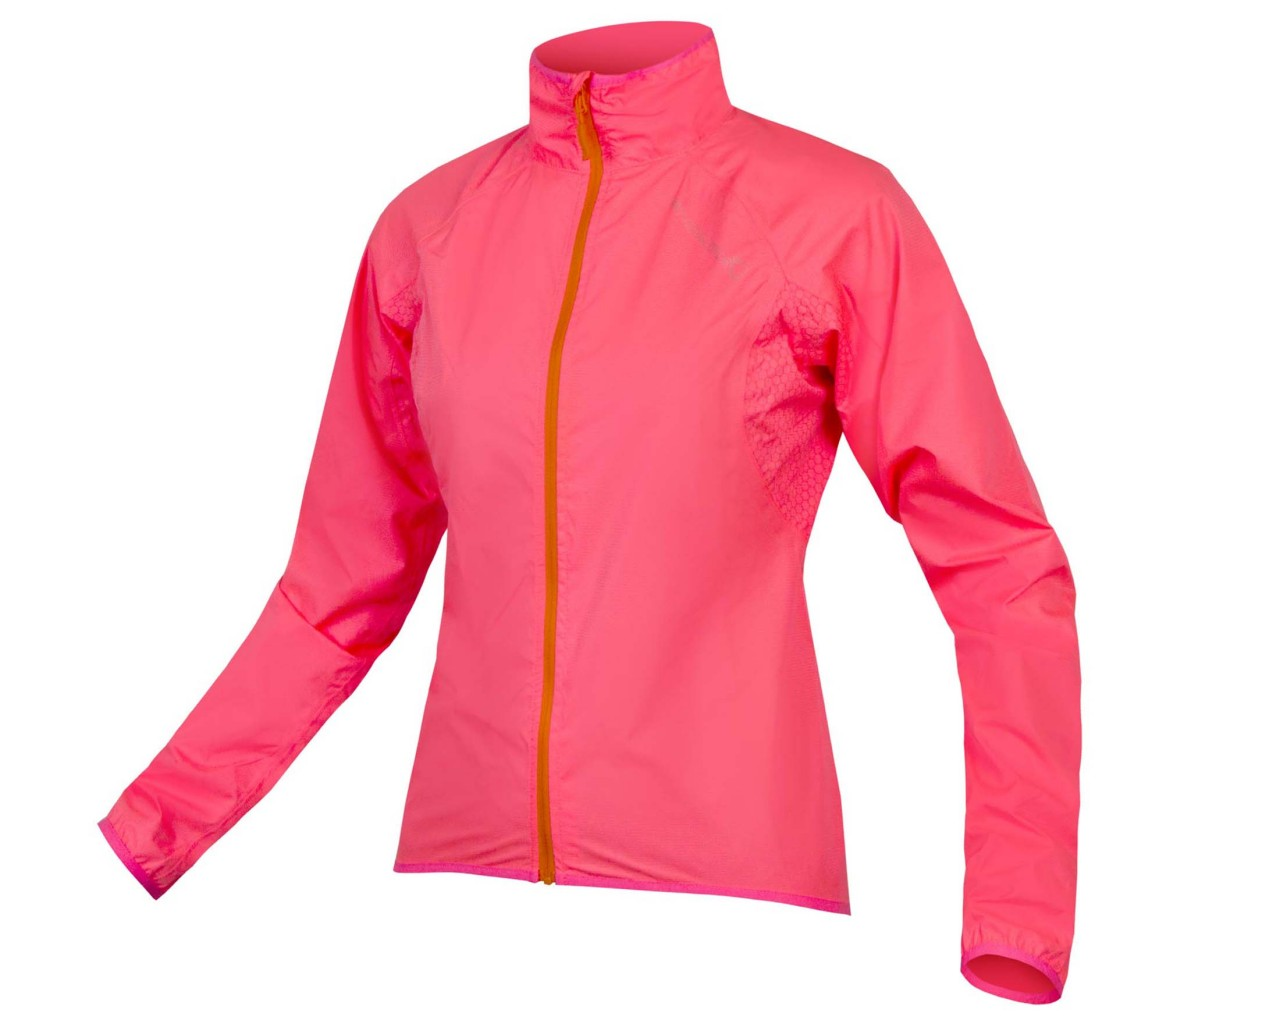 Endura Damen Xtract wasserdichte Jacke | neon pink